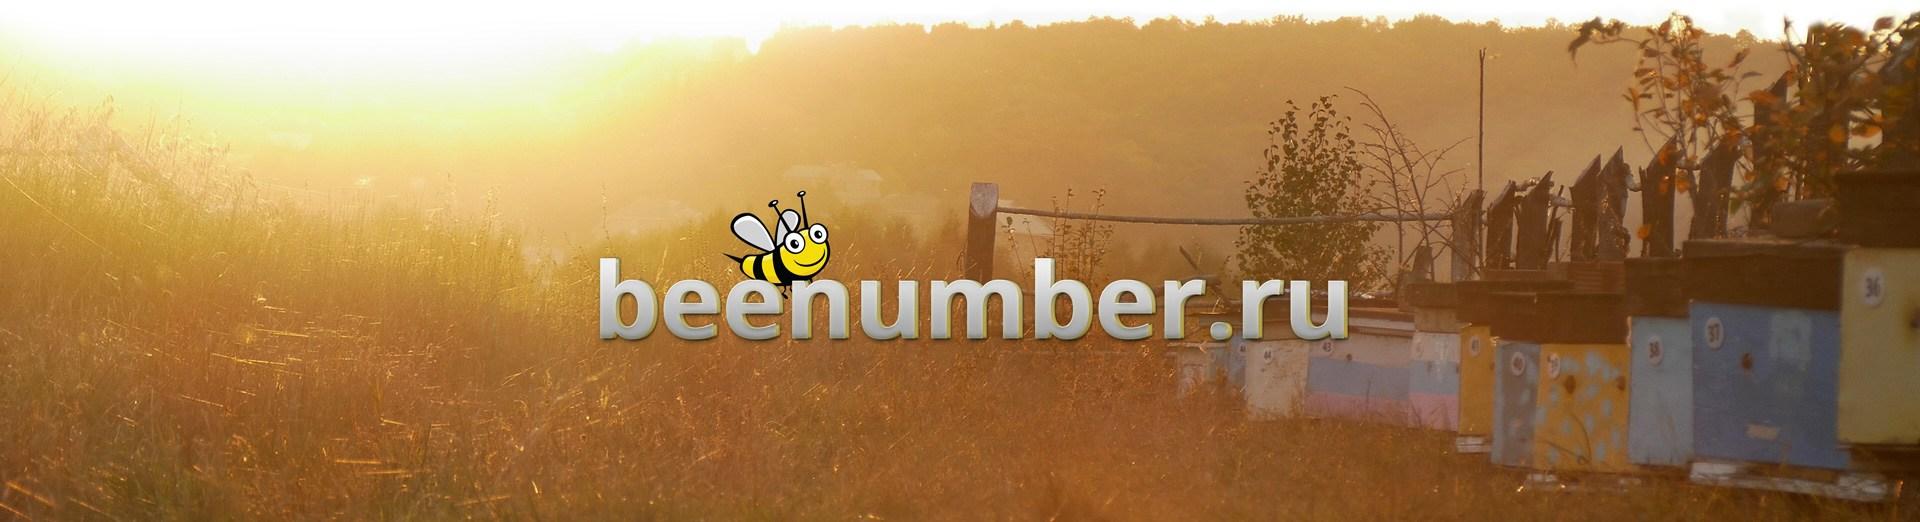 beenumber.ru — номерки для ульев